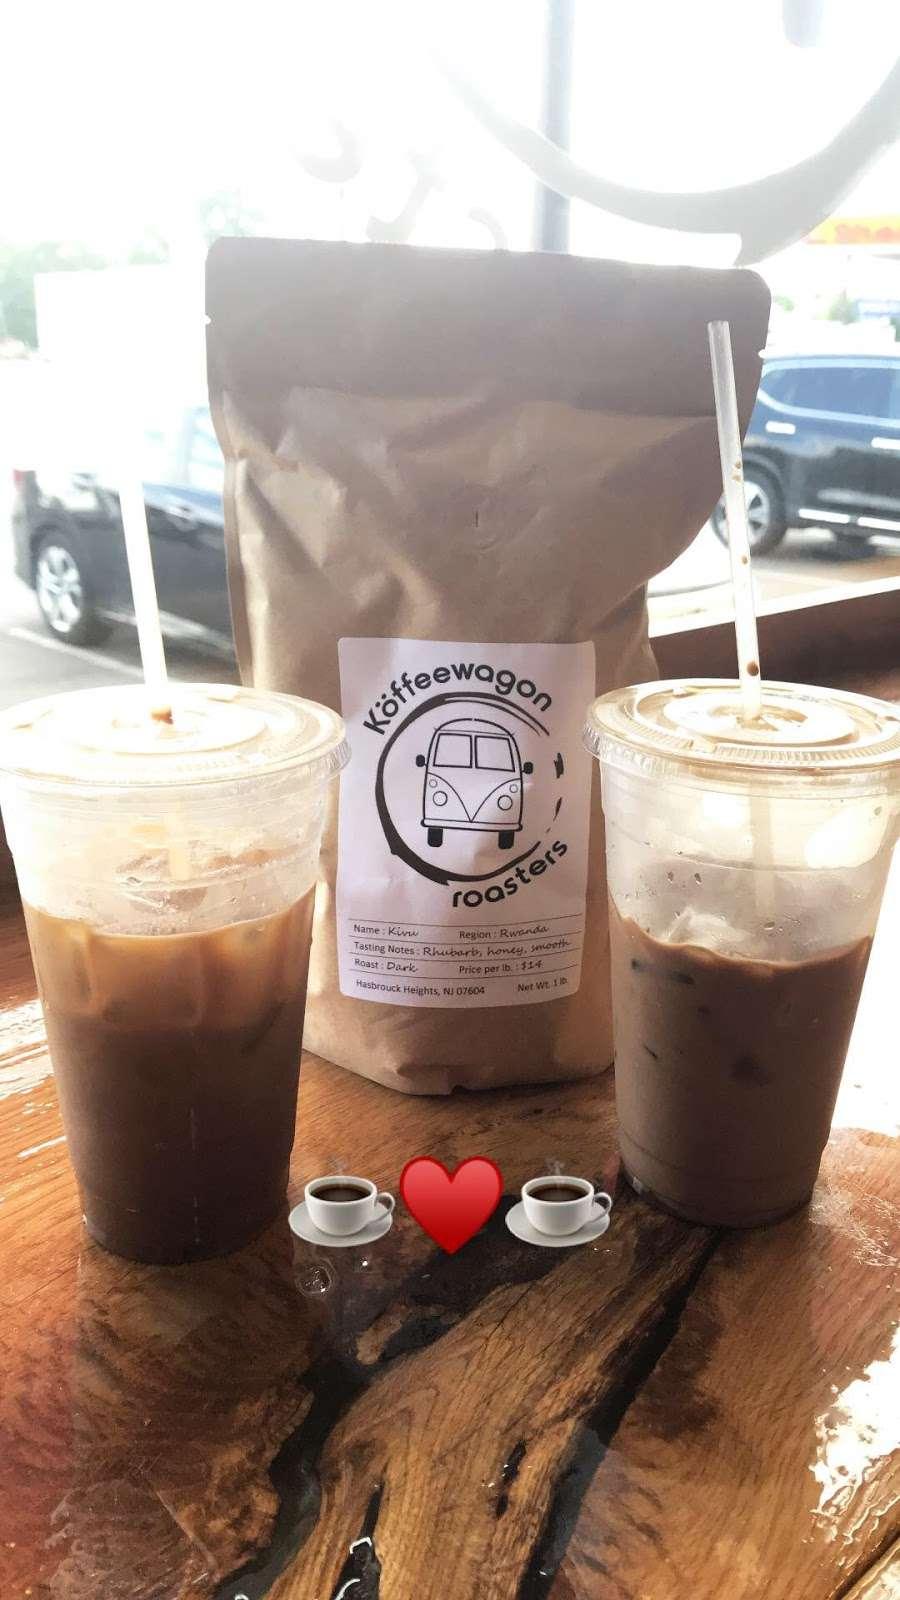 Koffeewagon Roasters - cafe  | Photo 7 of 10 | Address: 155 NJ-17, Hasbrouck Heights, NJ 07604, USA | Phone: (201) 426-0520